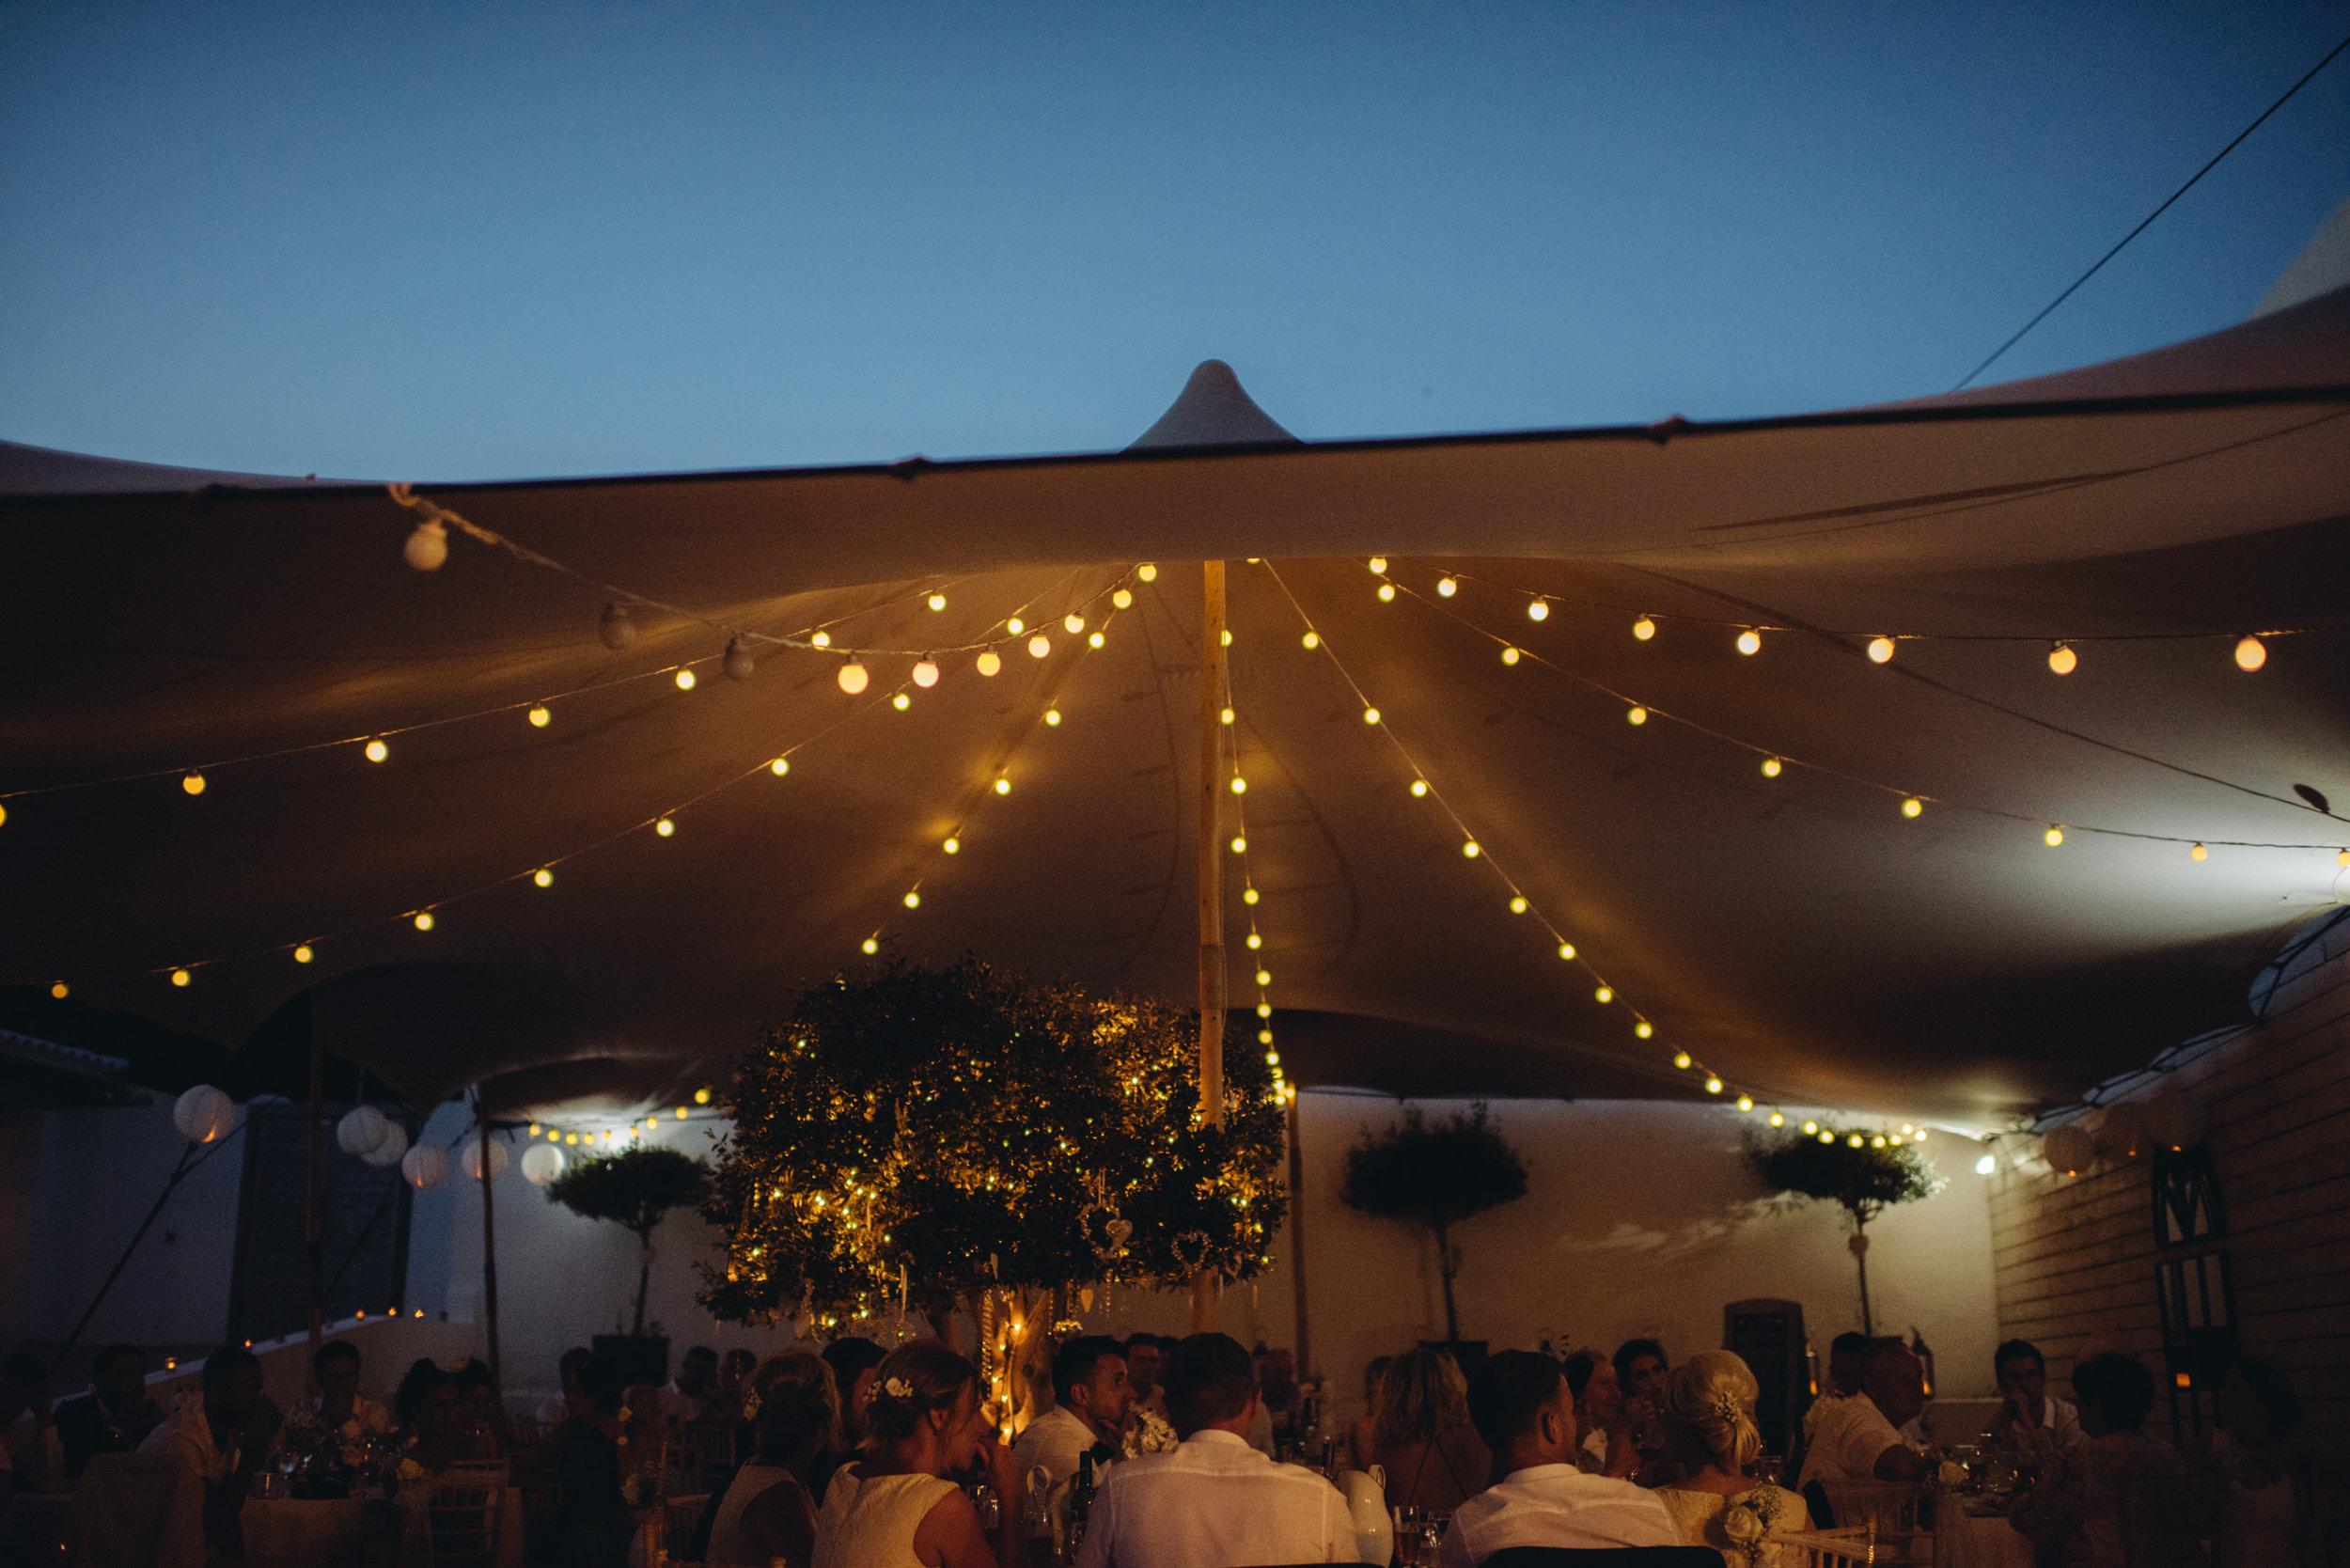 0161-IBIZA-ELIXIR-BEACH-CLUB-WEDDING-PHOTOGRAPHY-ALTERNATIVE-WEDDING-PHOTOGRAPHY.JPG